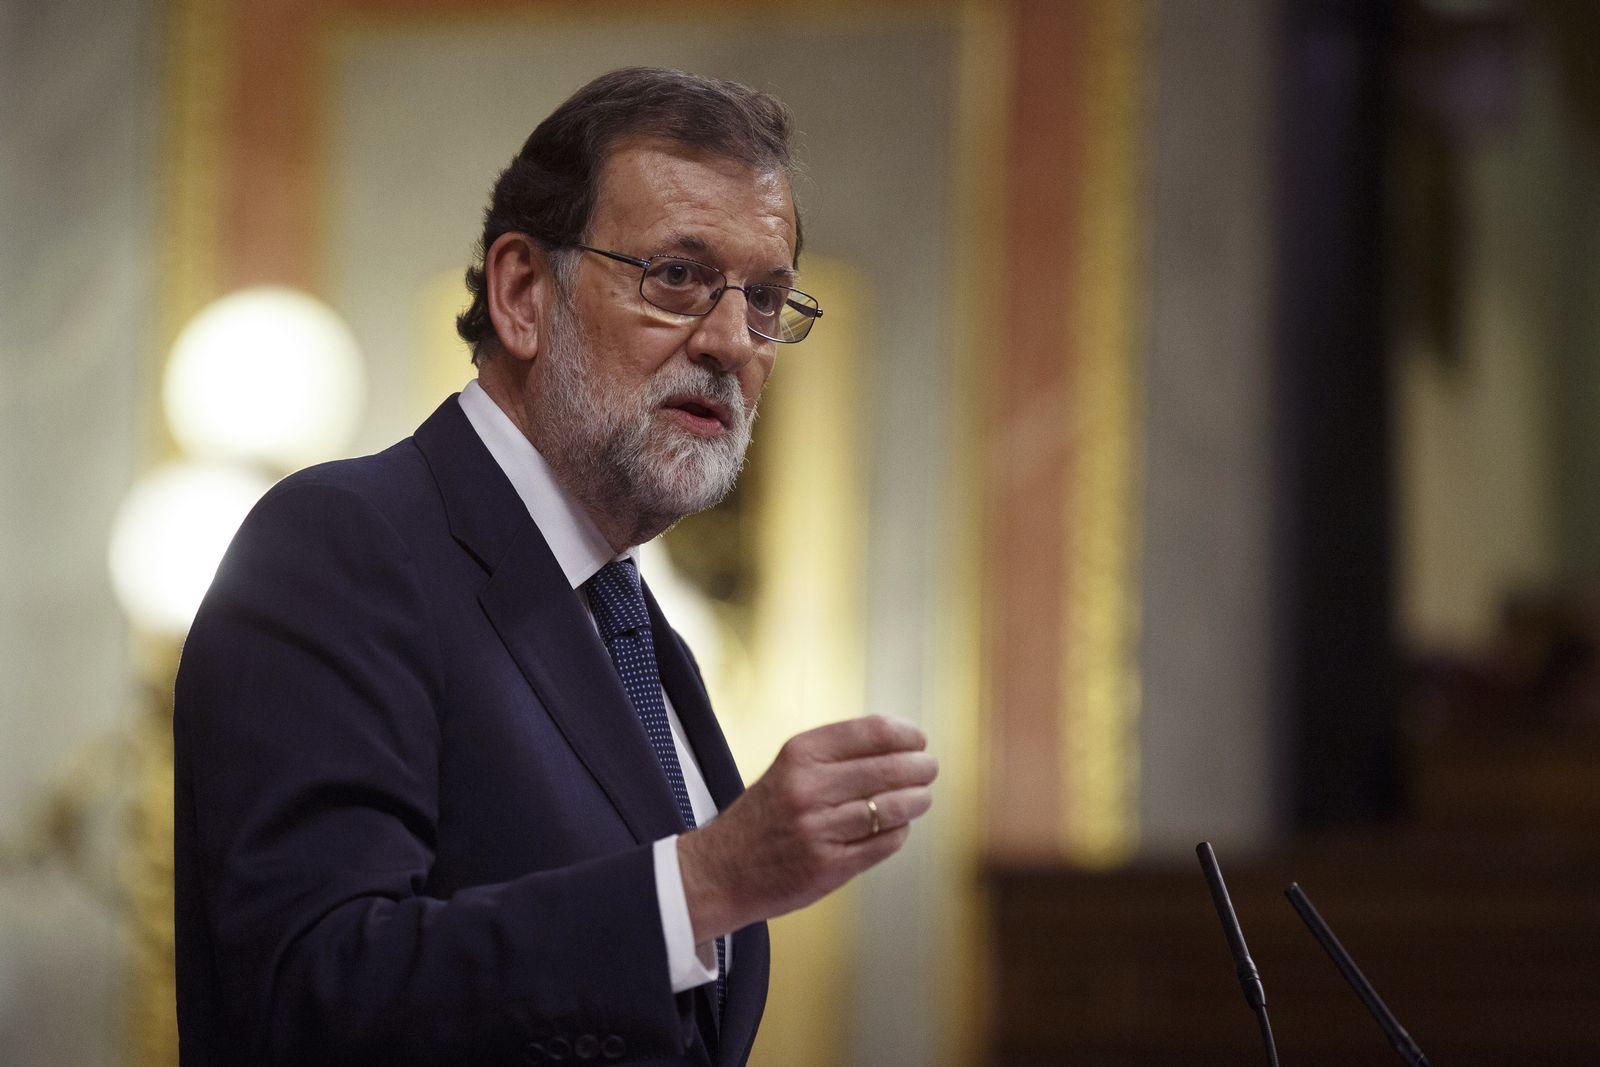 Mariano Rajoy/ Spanien/ Kaltalonien